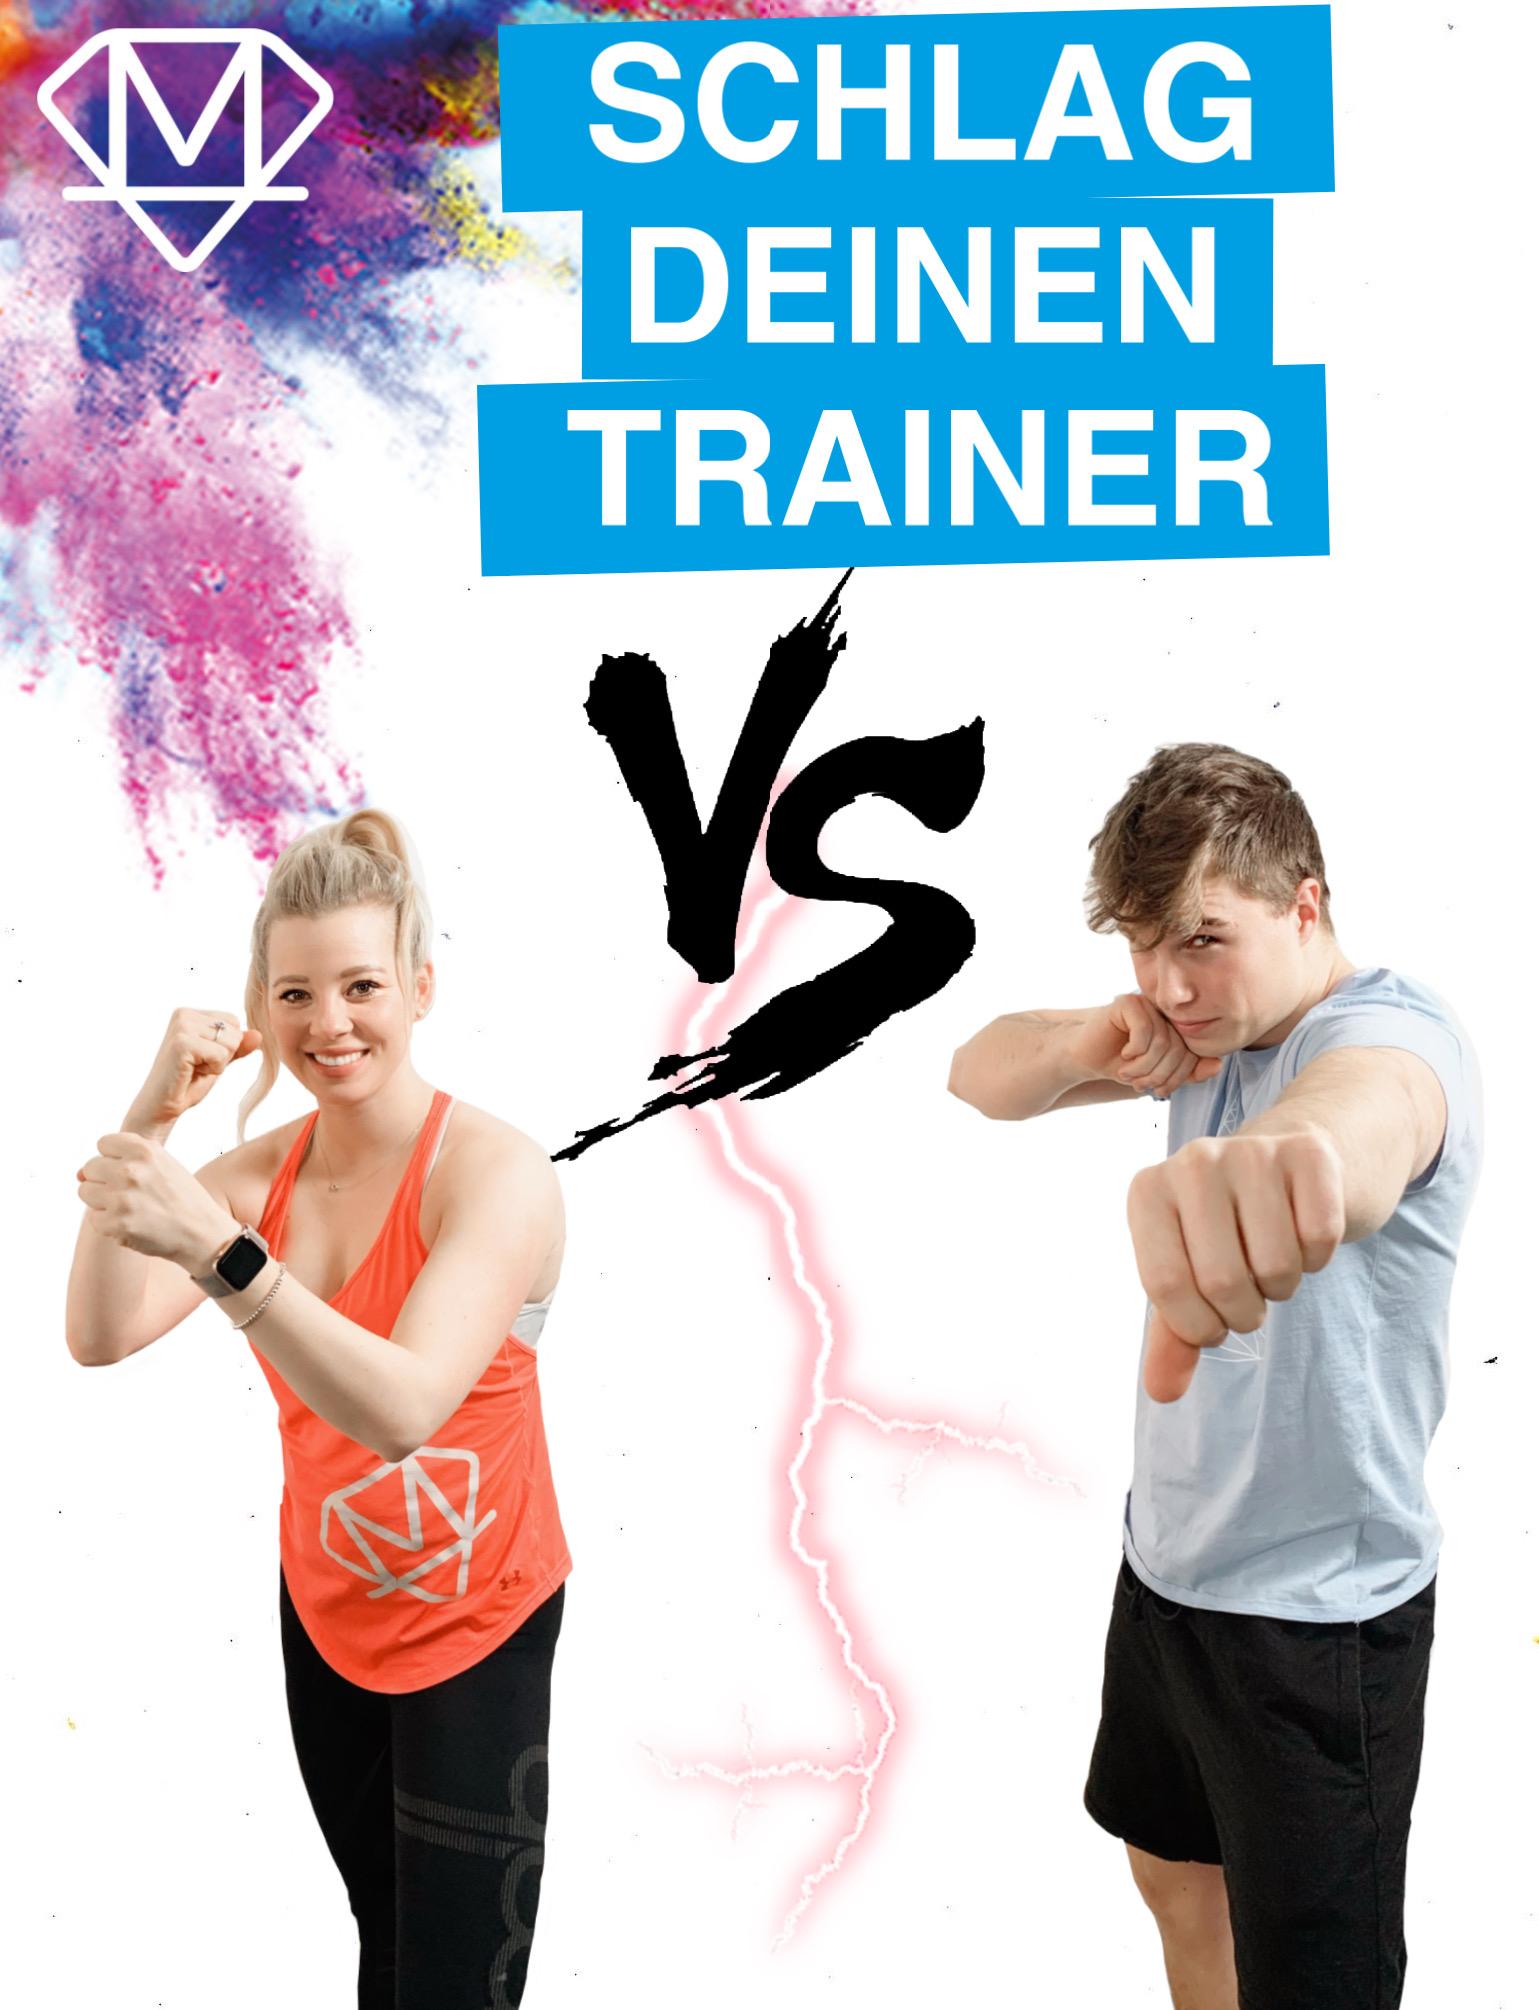 Schlag deinen Trainer: Alexandra VS Loris